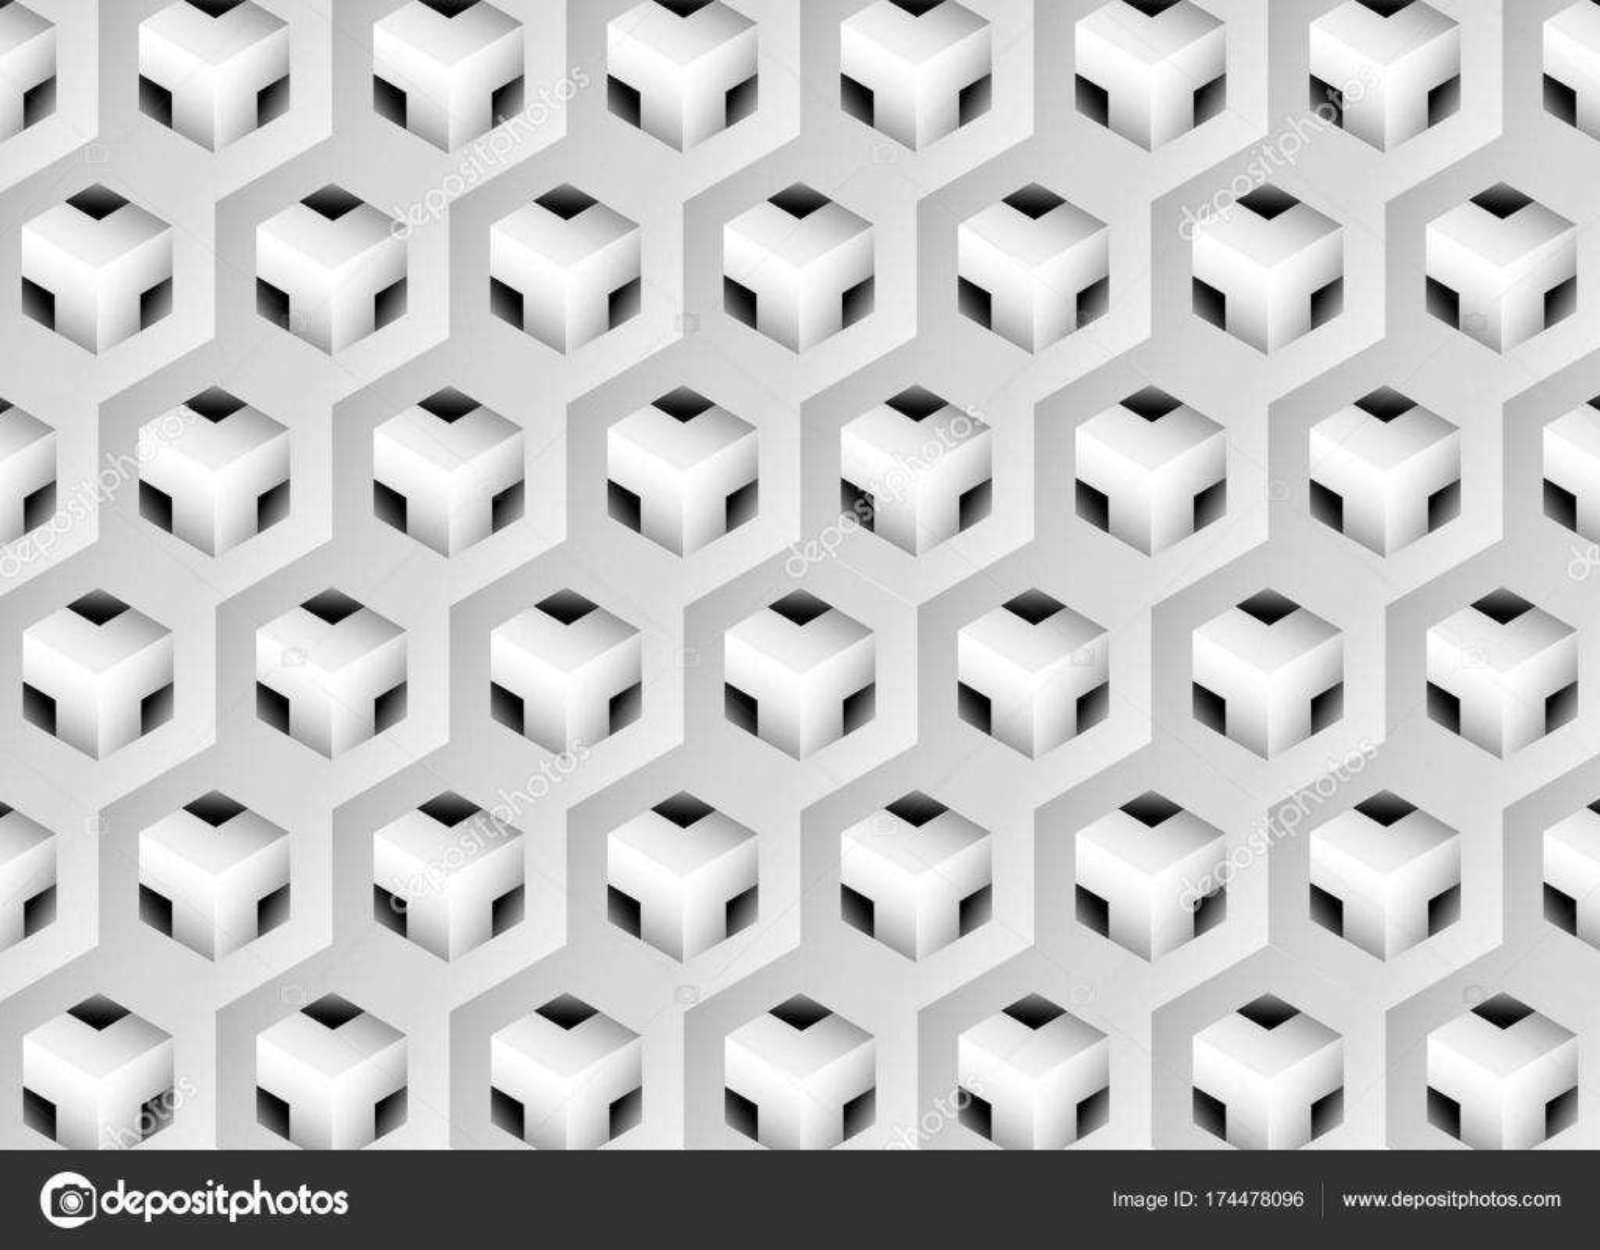 3 d の立体幾何学模様 - イラスト、壁紙、背景、パターン、抽象的な